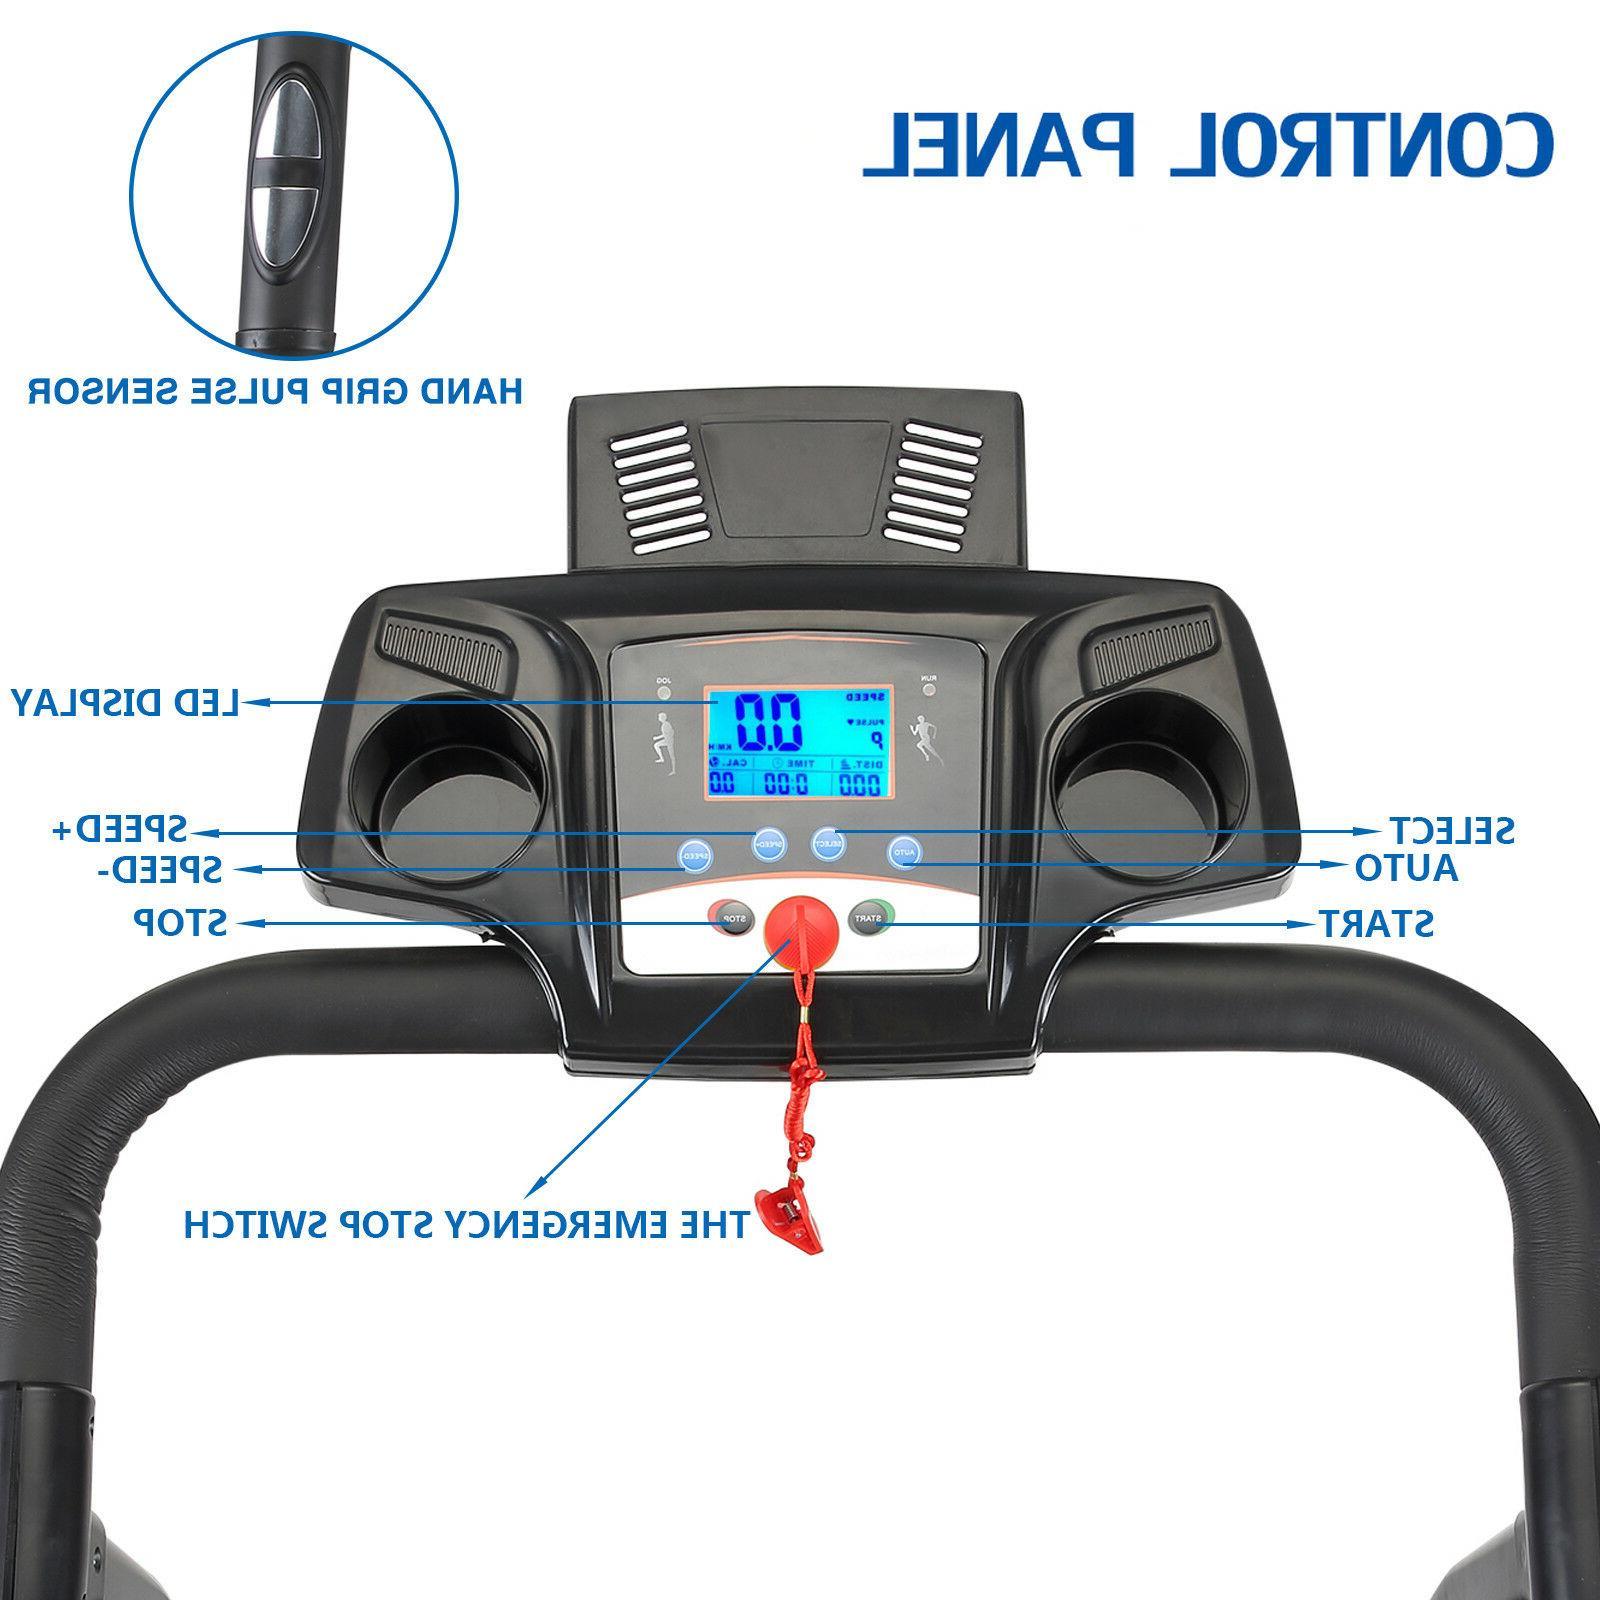 2HP Folding Treadmill Electric Motorized 12KM/H Running Fitness Machine